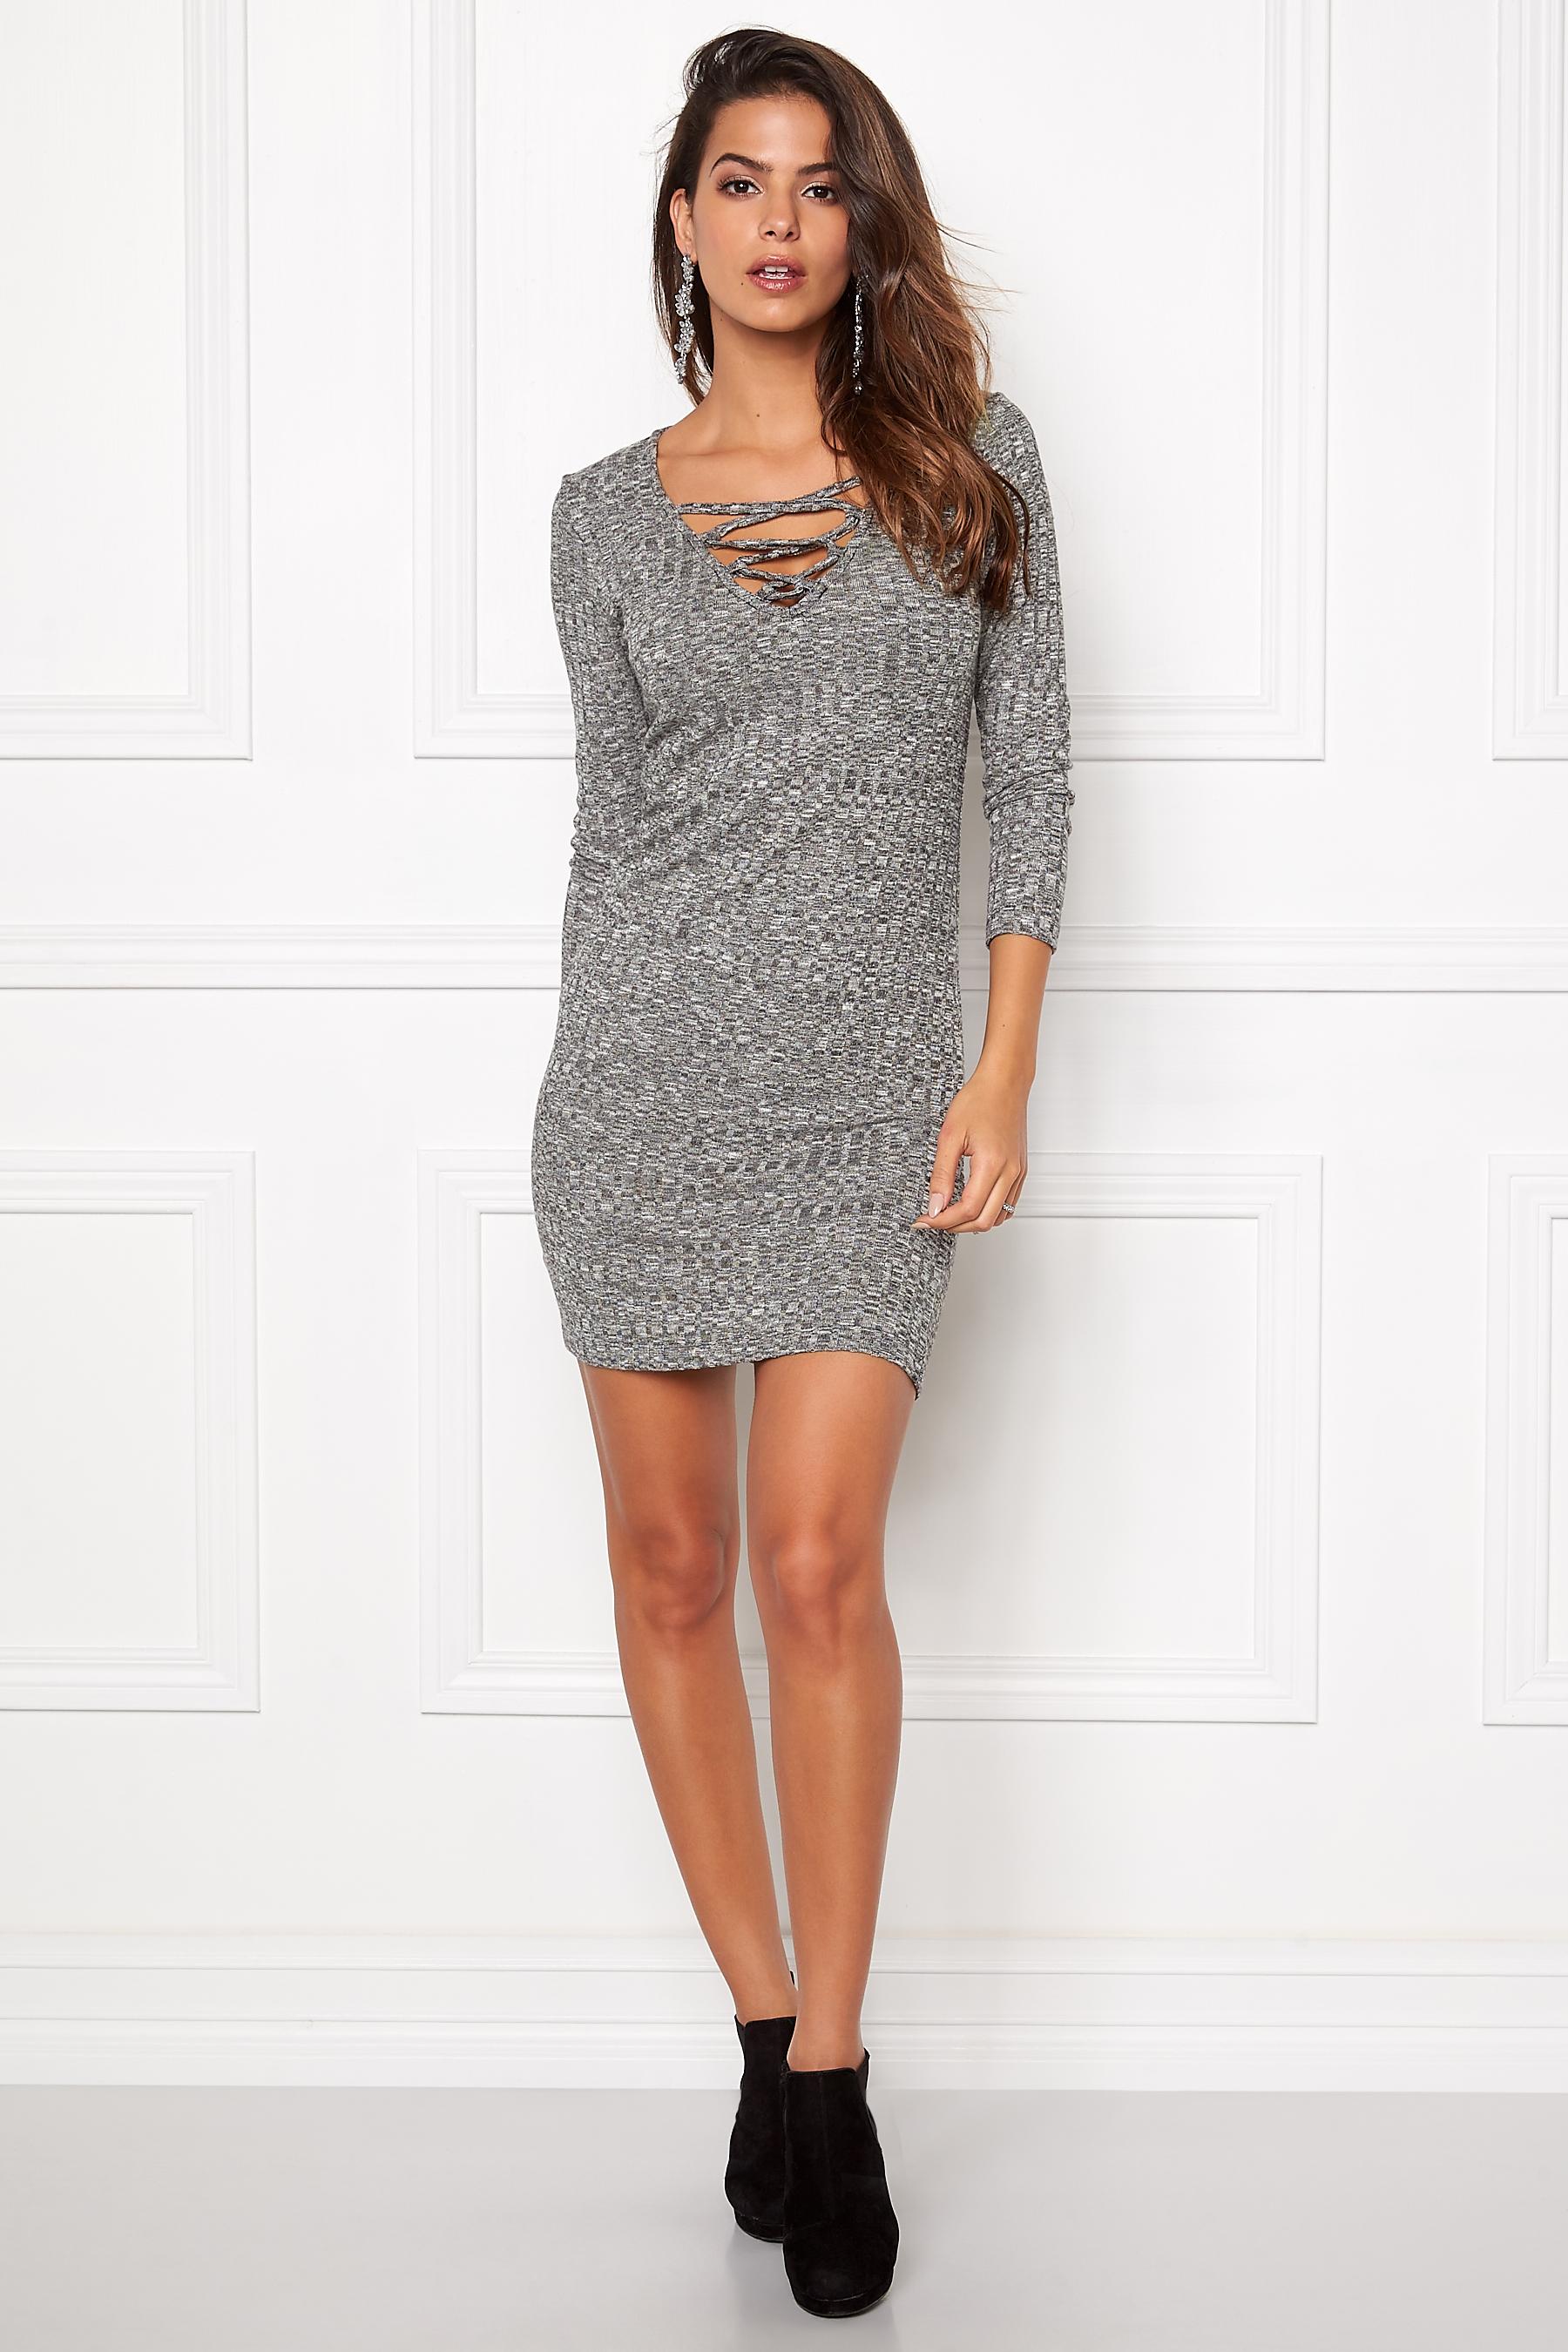 TrulyMine Lea Dress Darkgreymelange - Bubbleroom 5a223efca2dc3